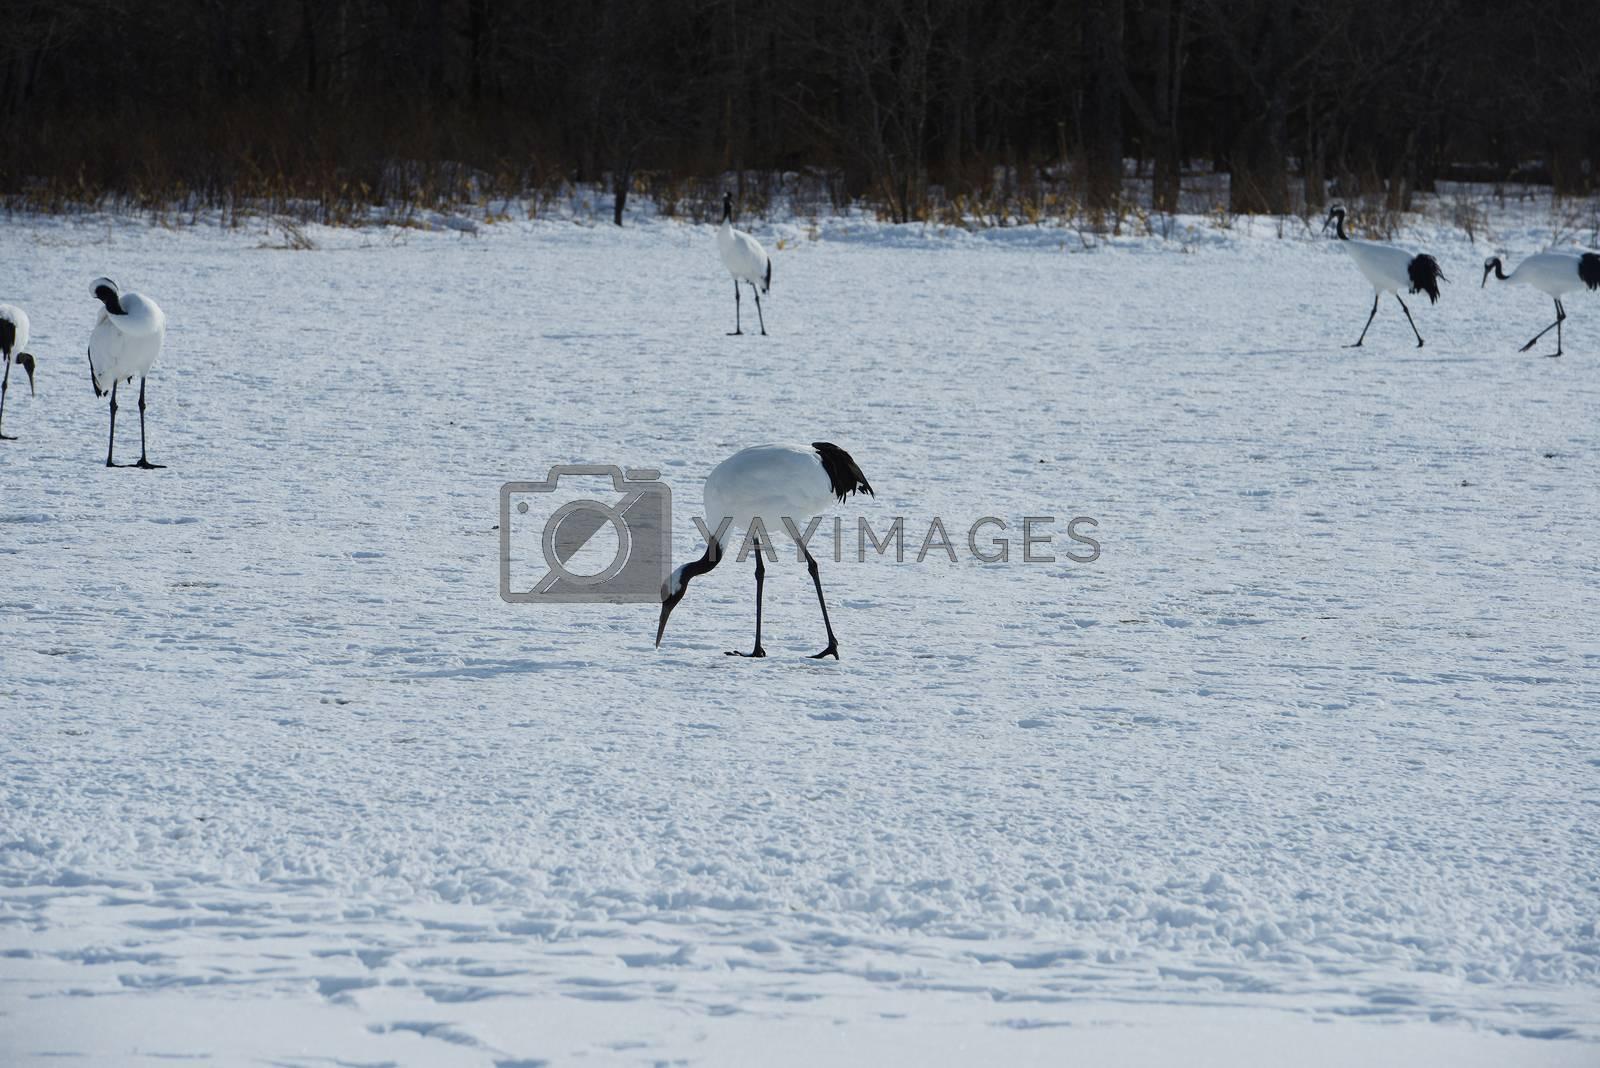 Royalty free image of Japanese crane by porbital